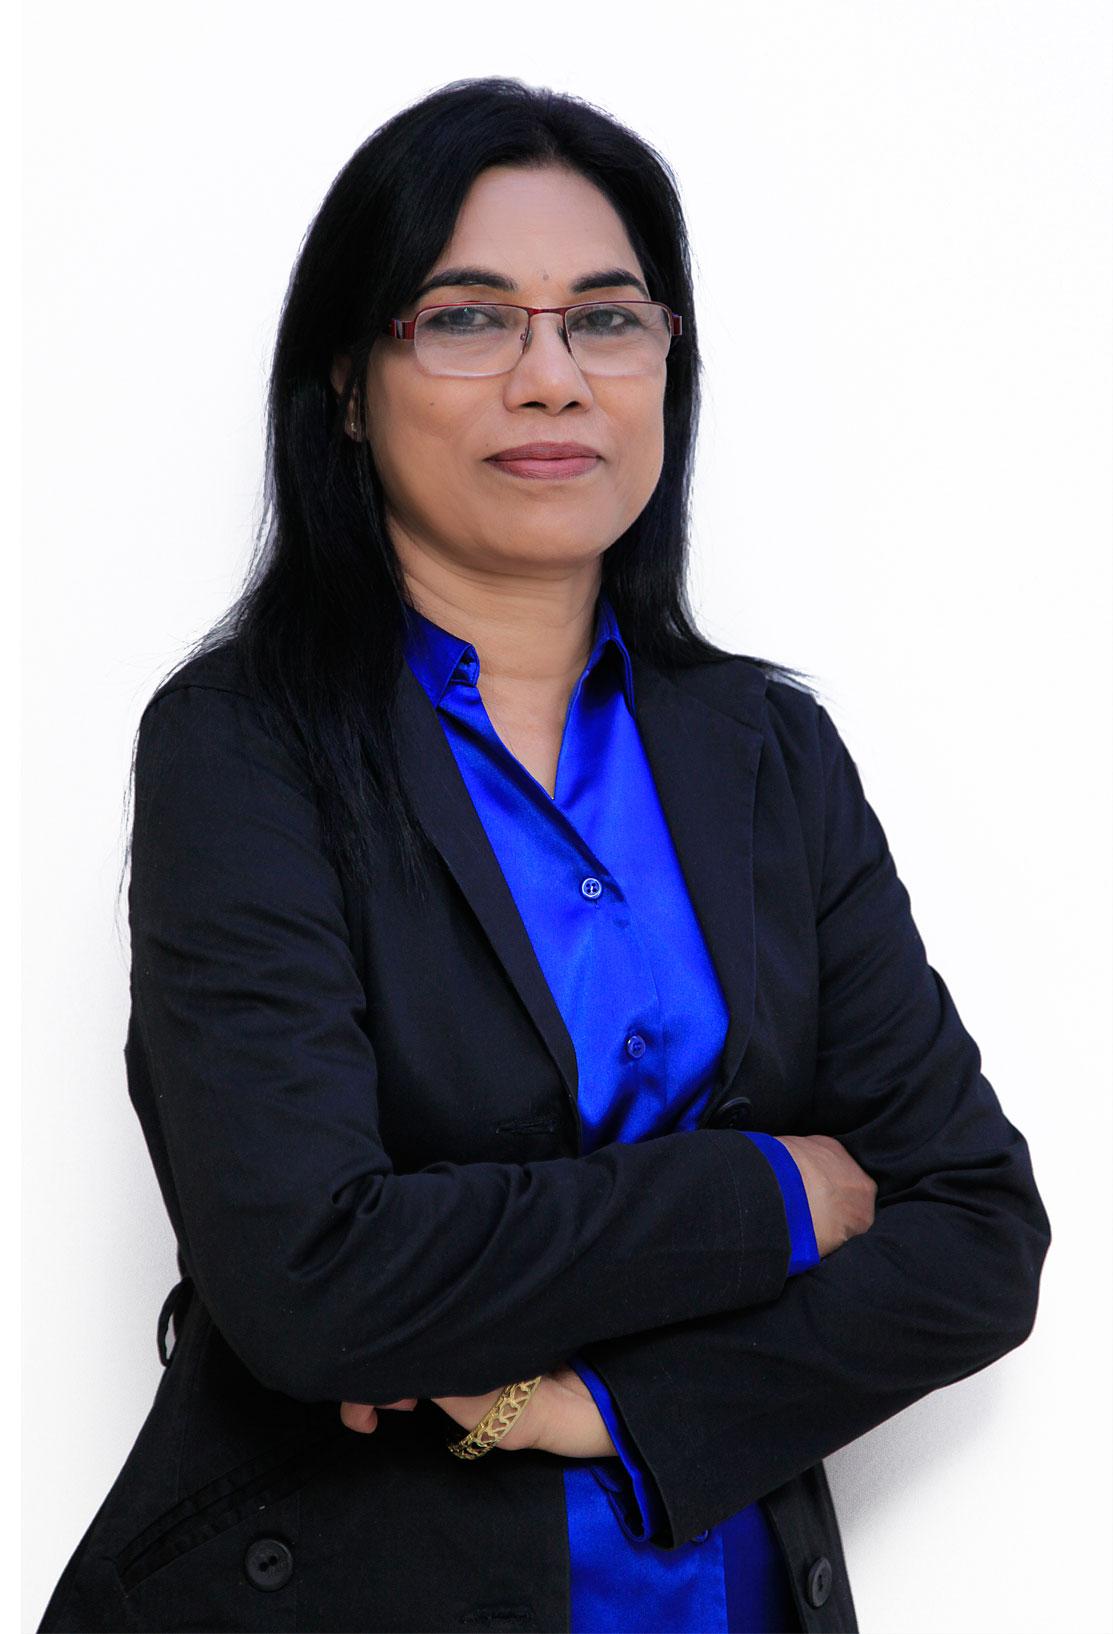 http://mgmmedical.ae/wp-content/uploads/2018/04/Dr-Usha-Rani.jpg